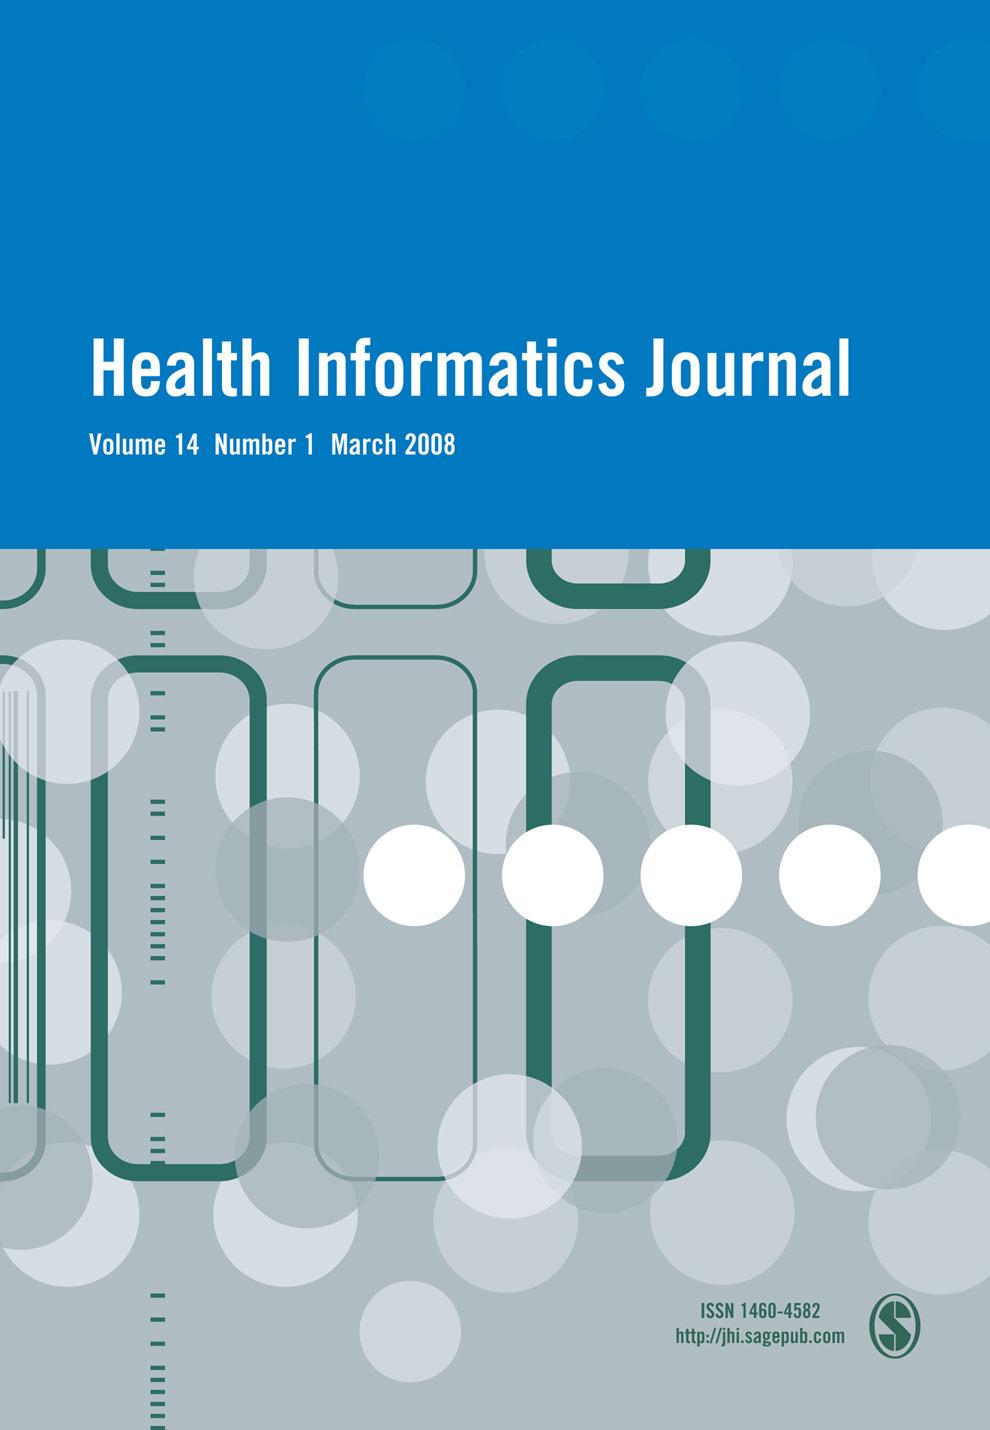 Health Informatics Journal